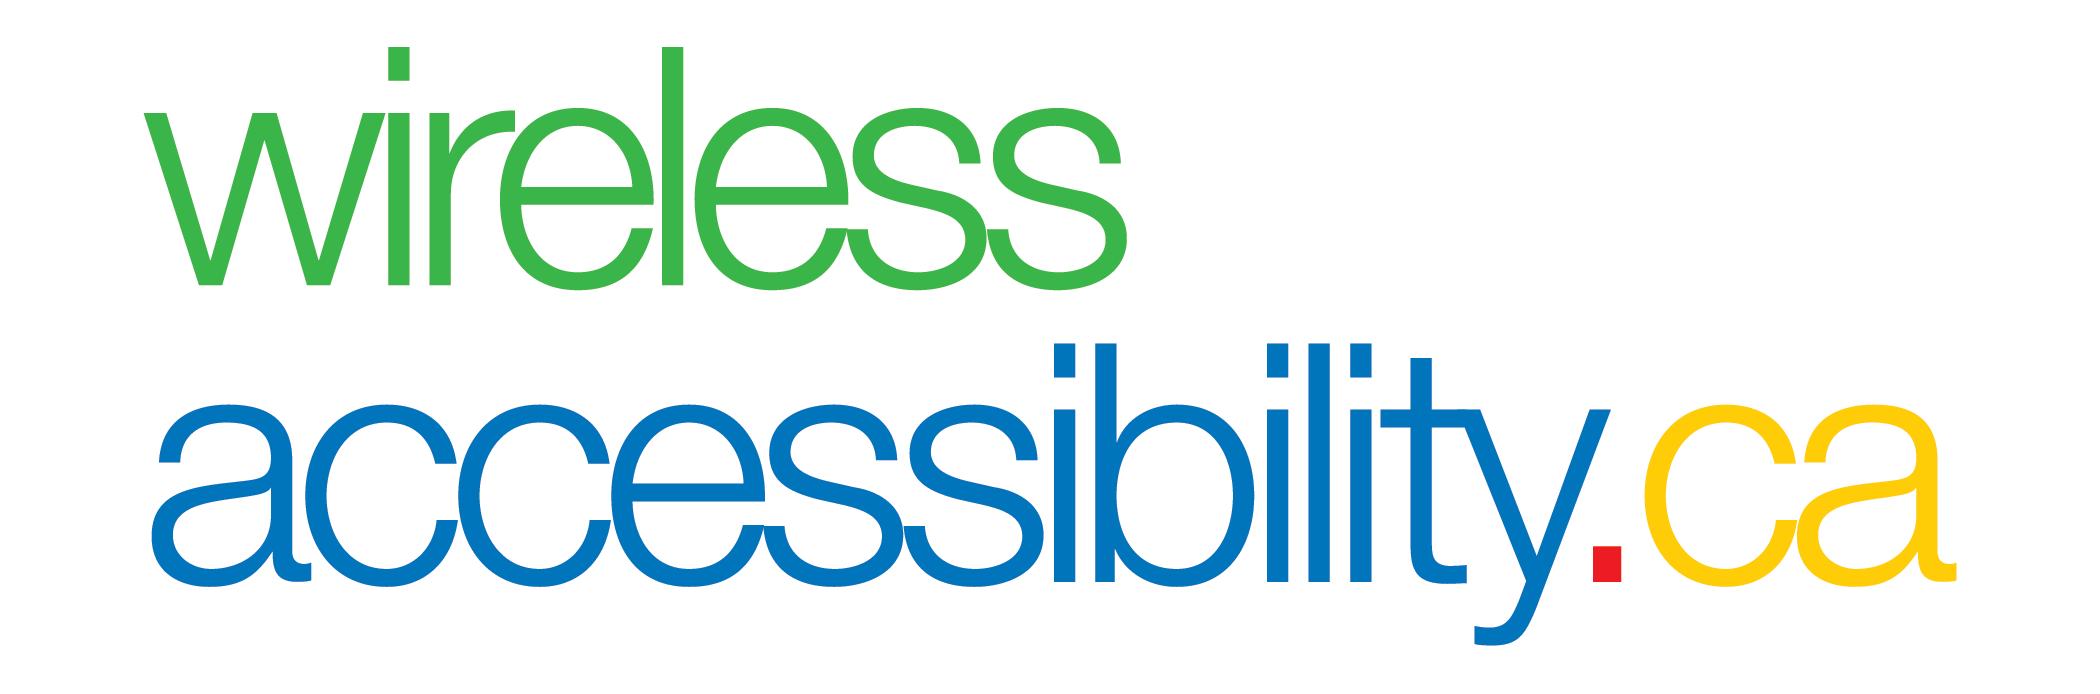 Wireless Accessibility Logo